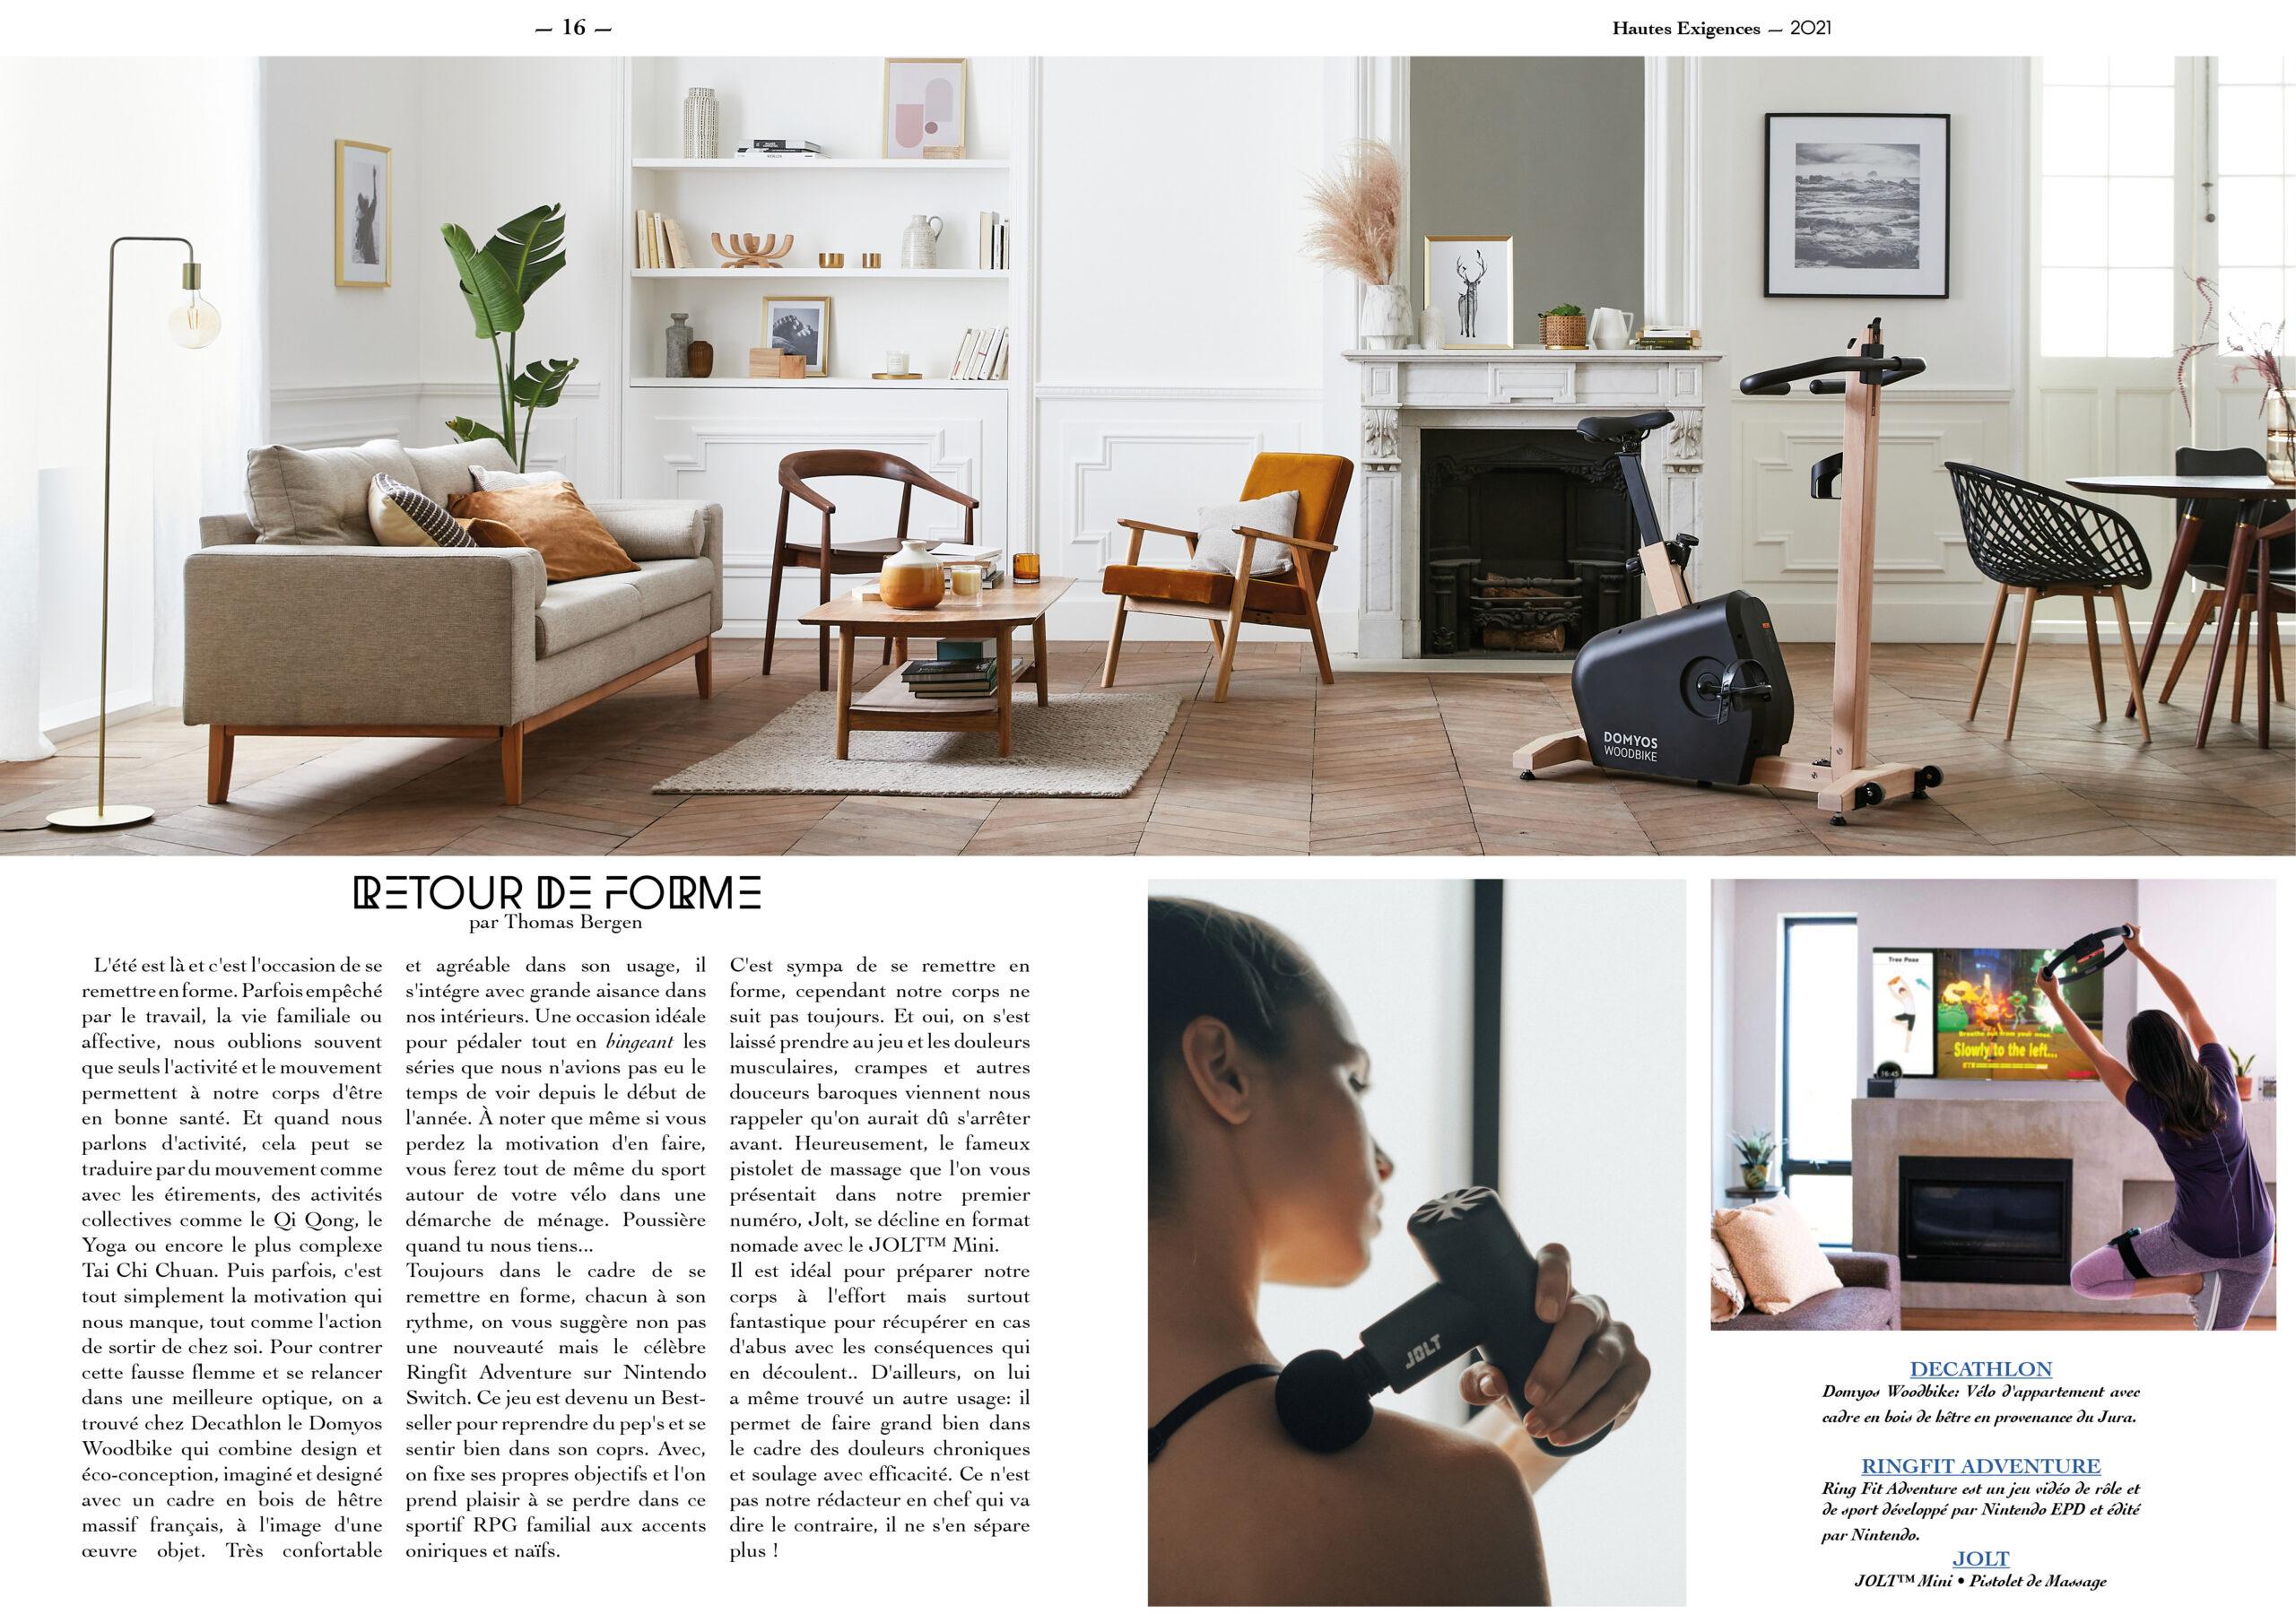 Hautes Exigences Magazine Hors Serie 2021 page 16-17